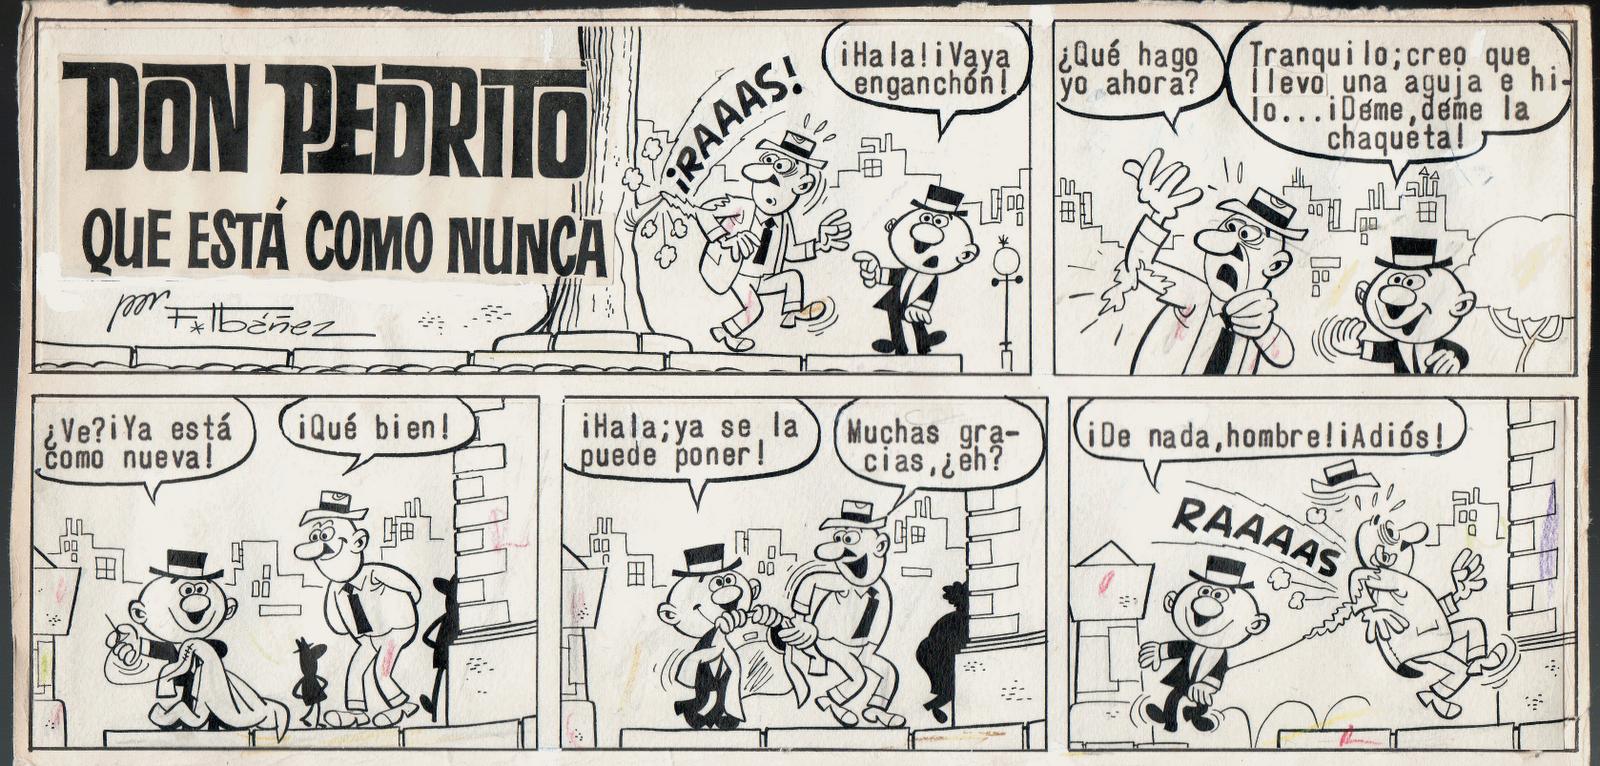 Don+Pedrito+1+ok.png